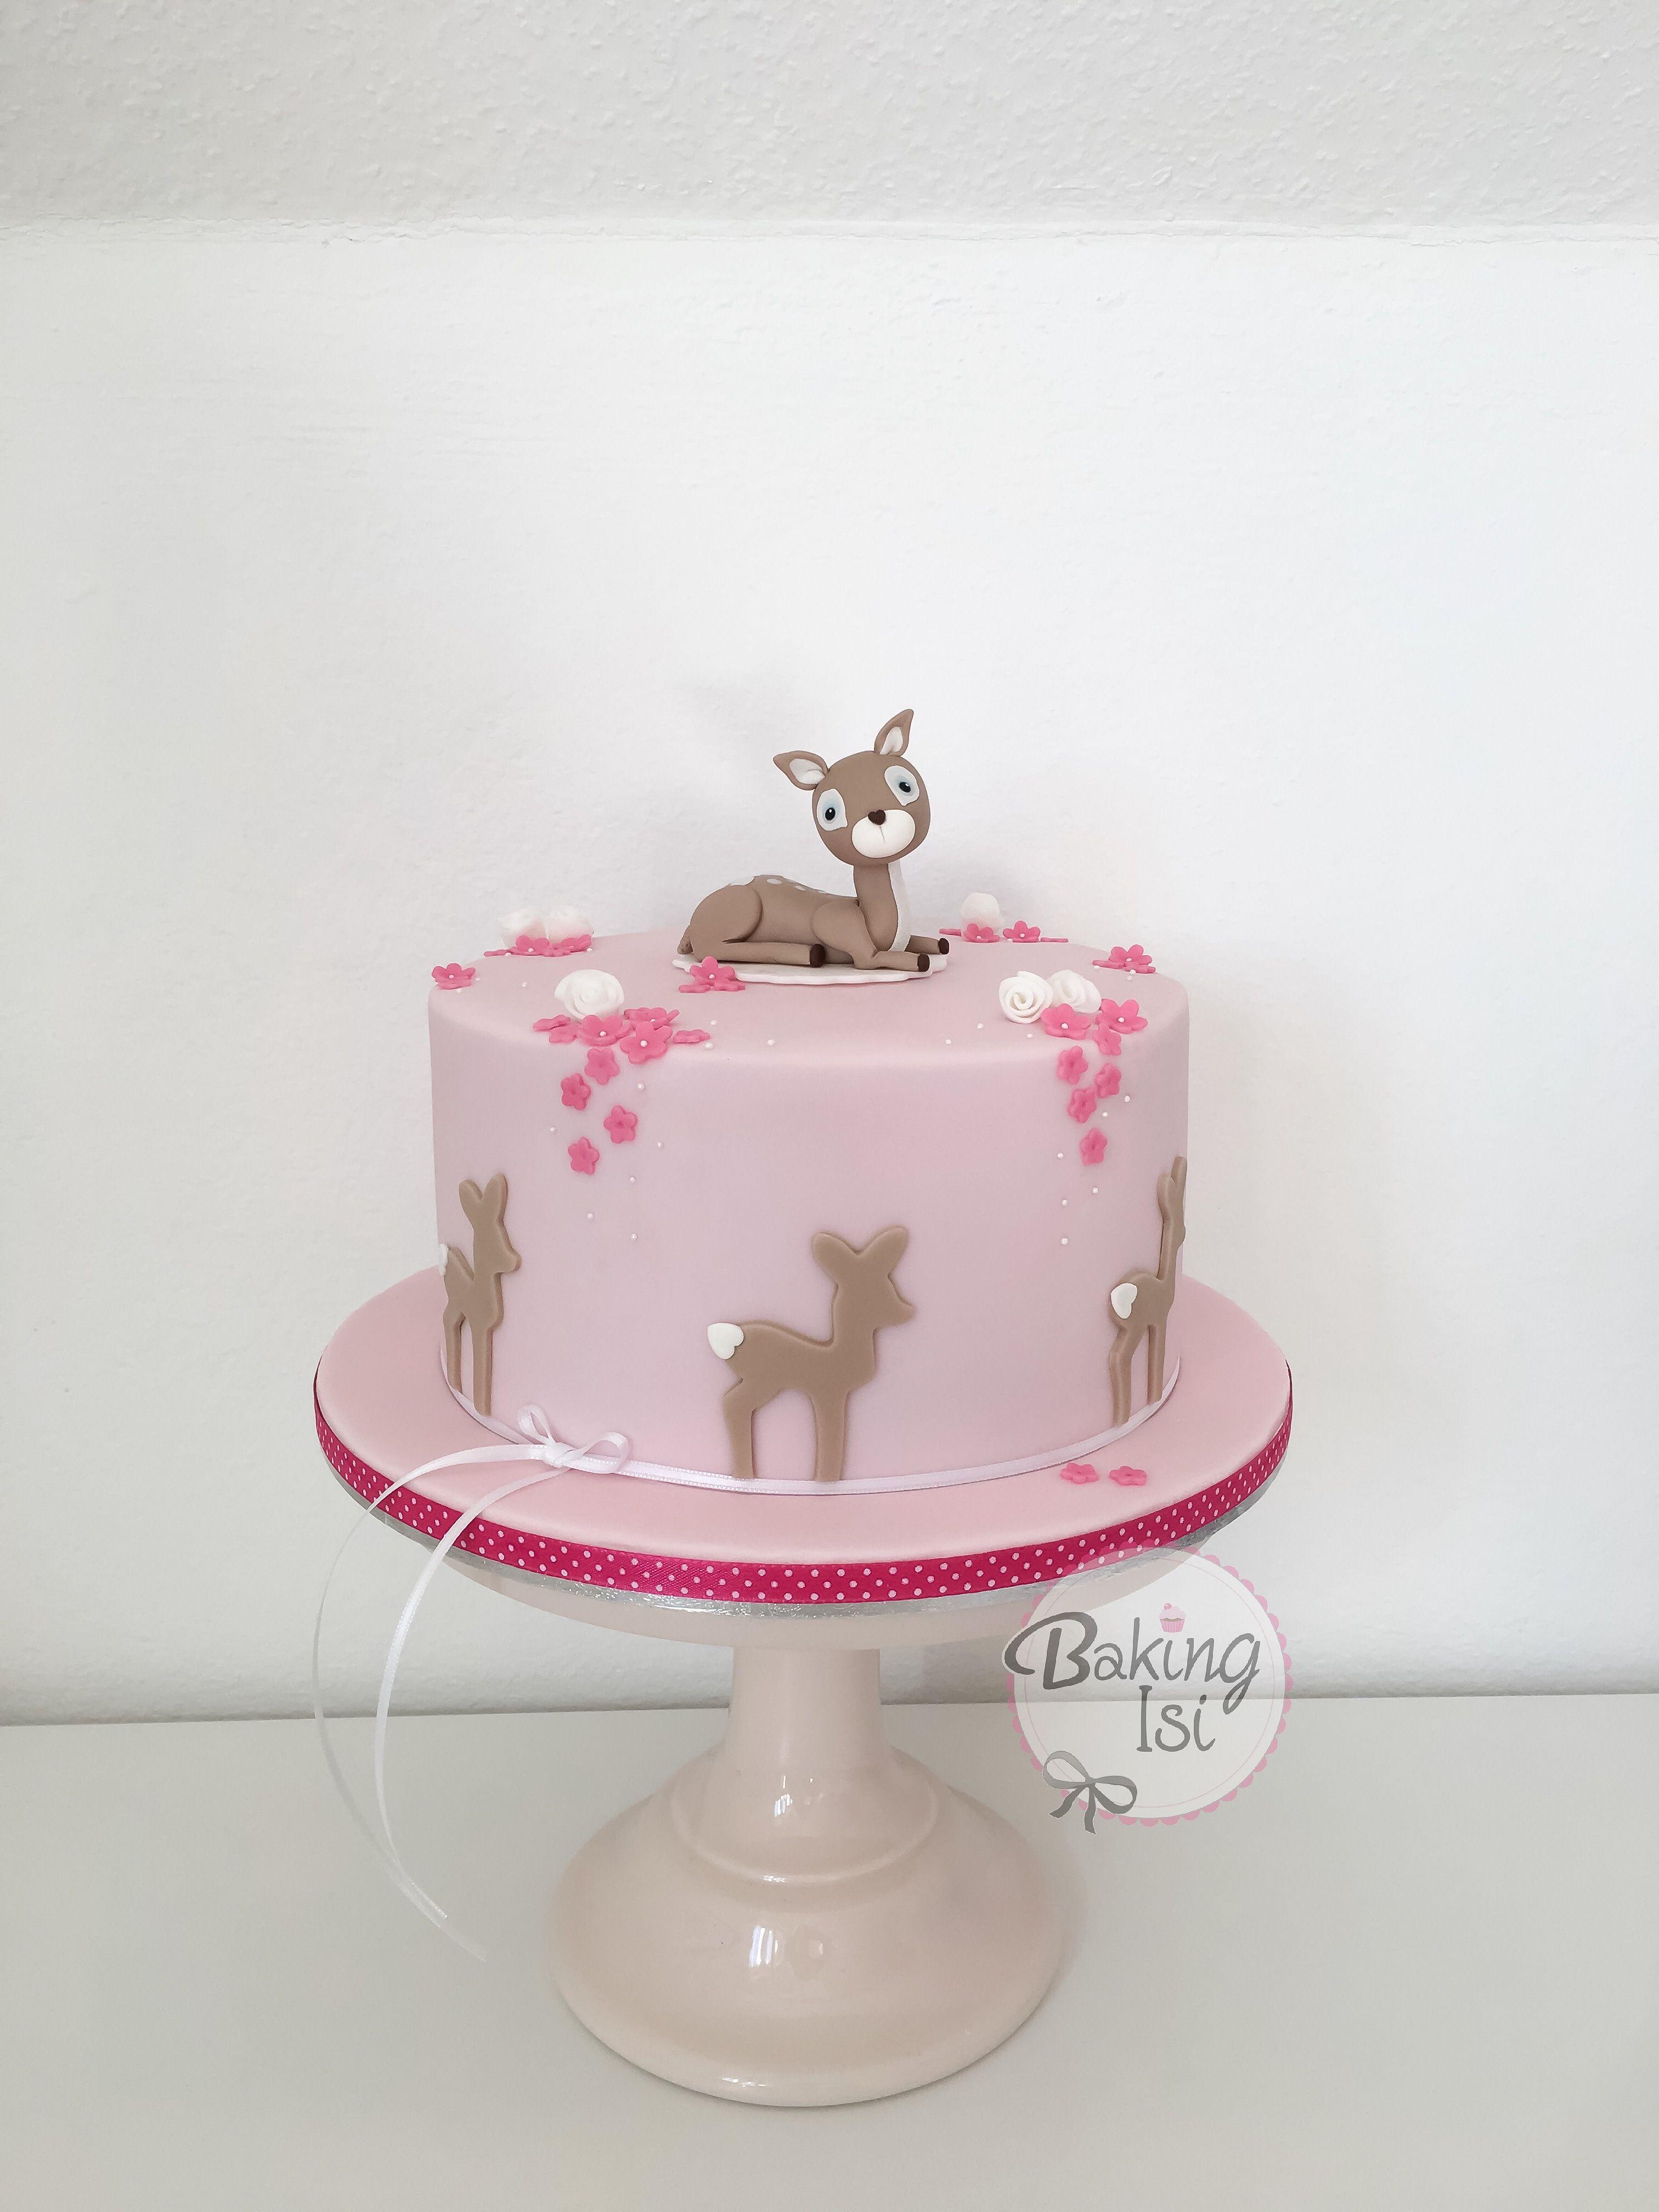 Bambi deer fawn reh cake Torte babyshower babyparty Baby